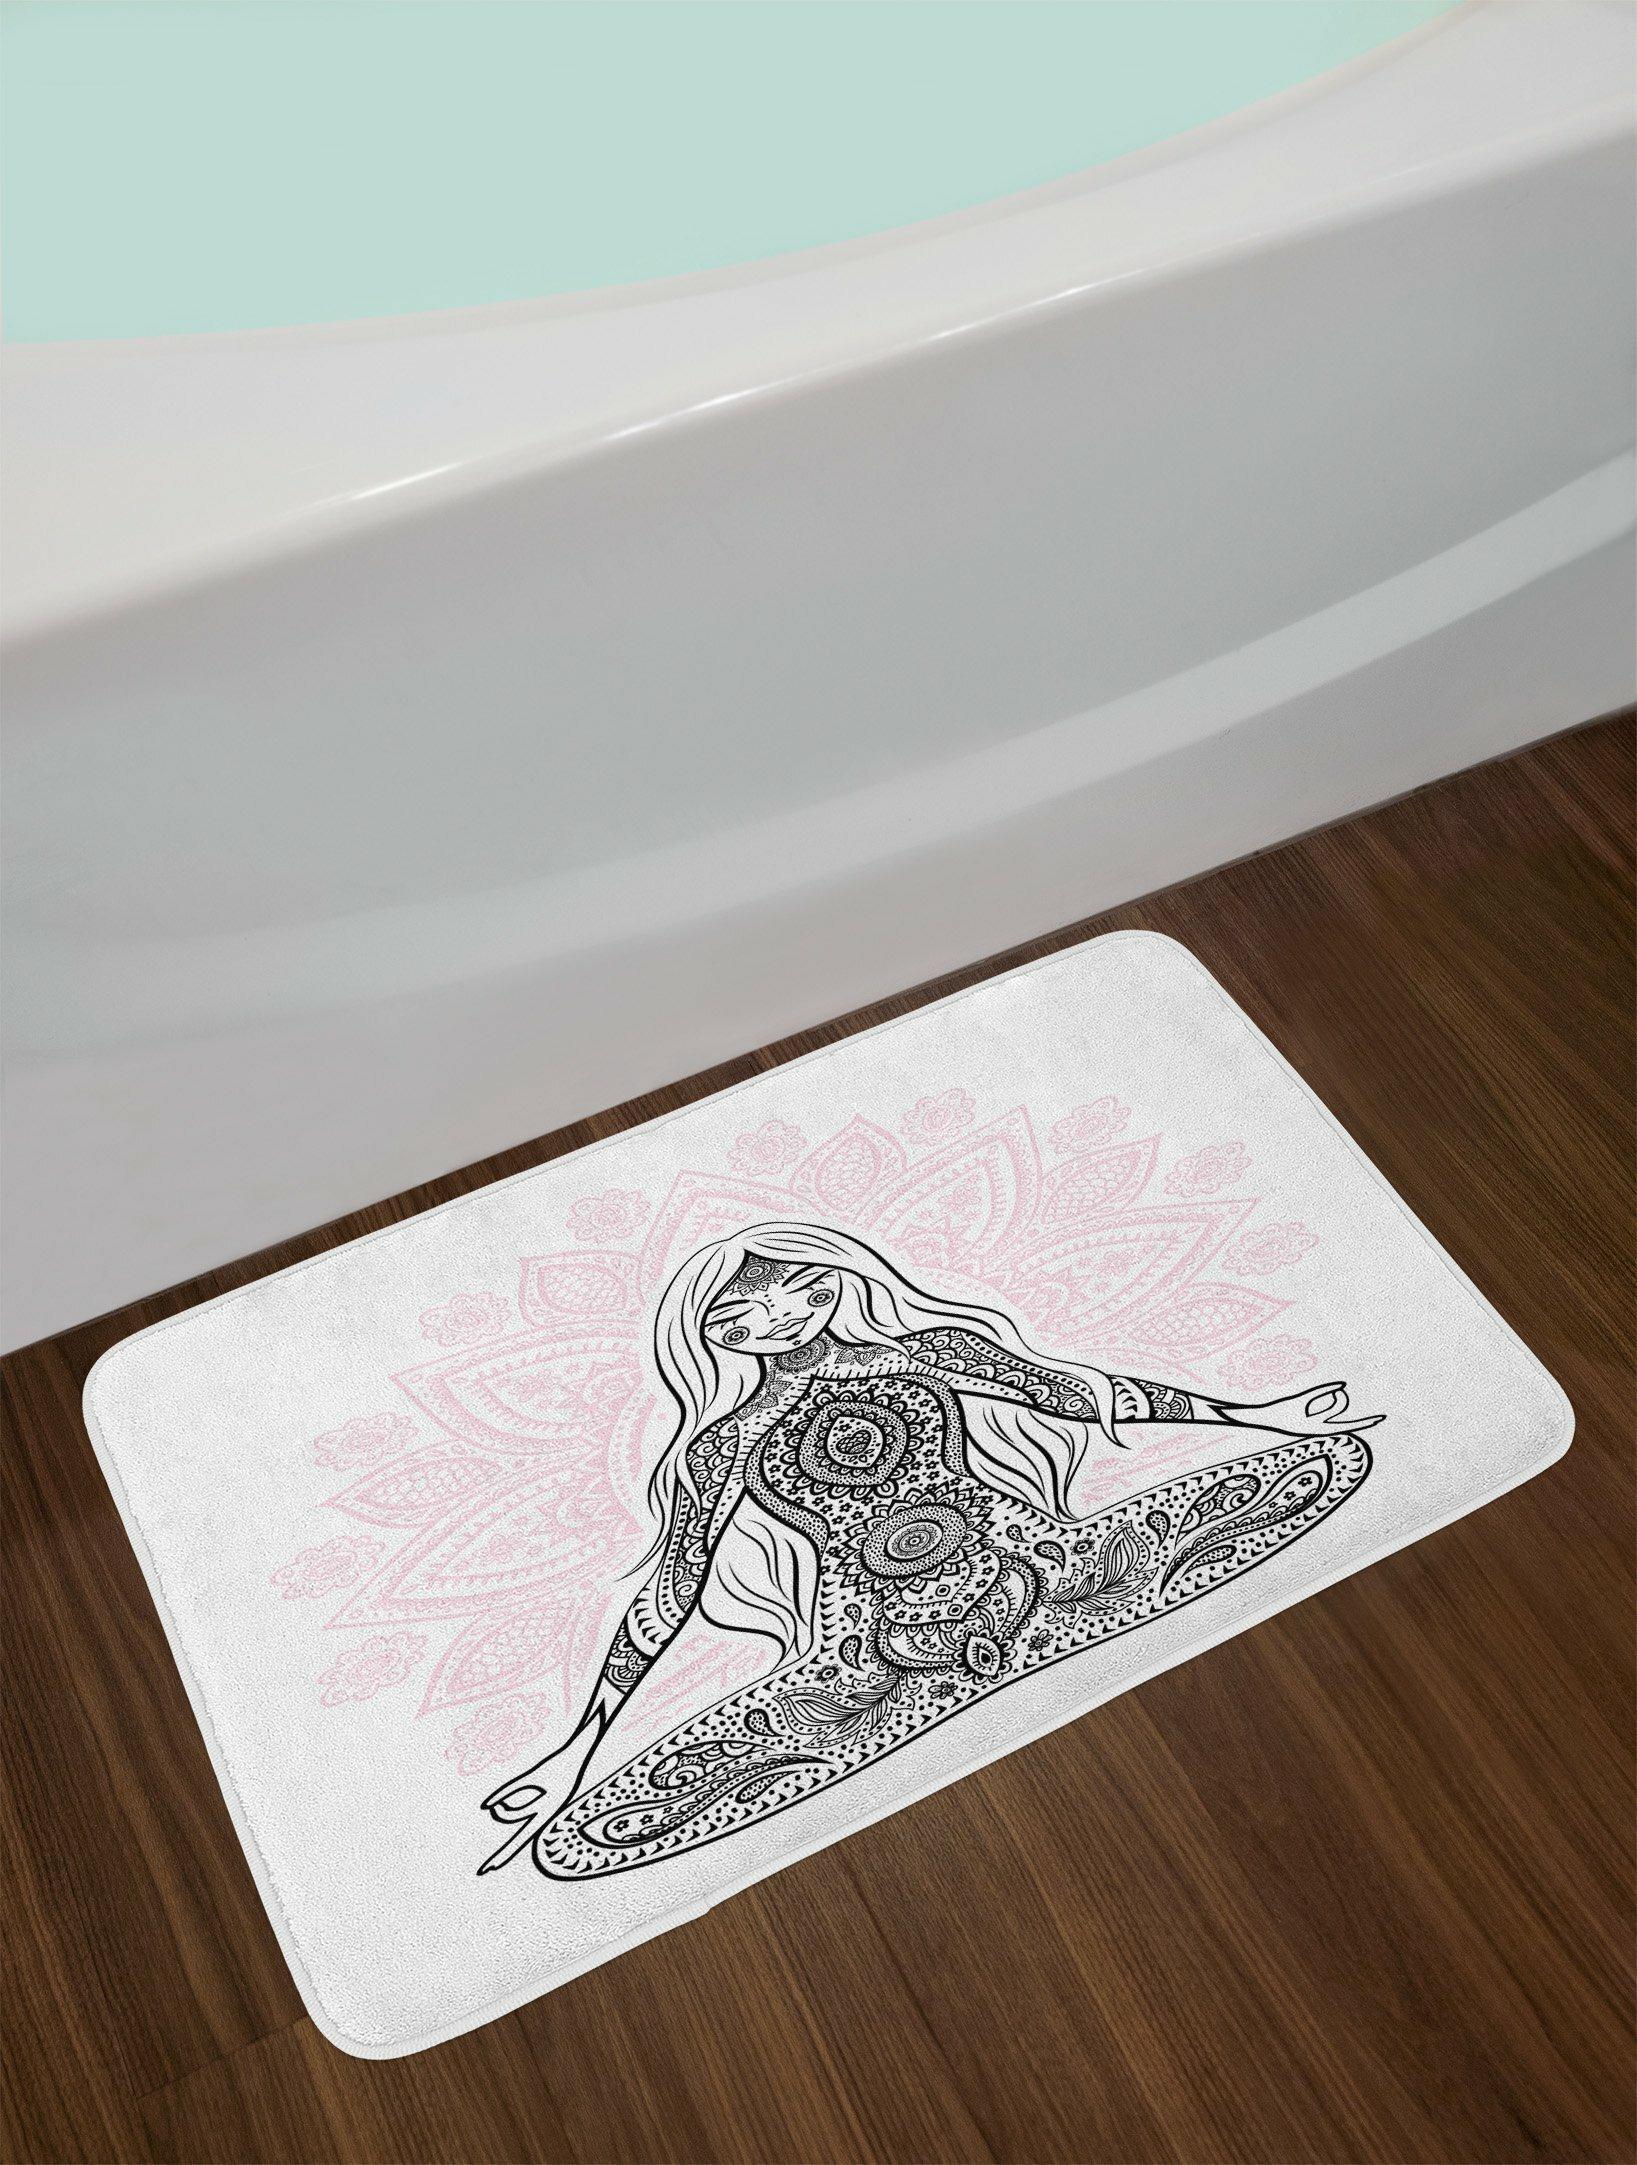 East Urban Home Chakra Ornate Girl Figure On Lotus Flower Bath Rug